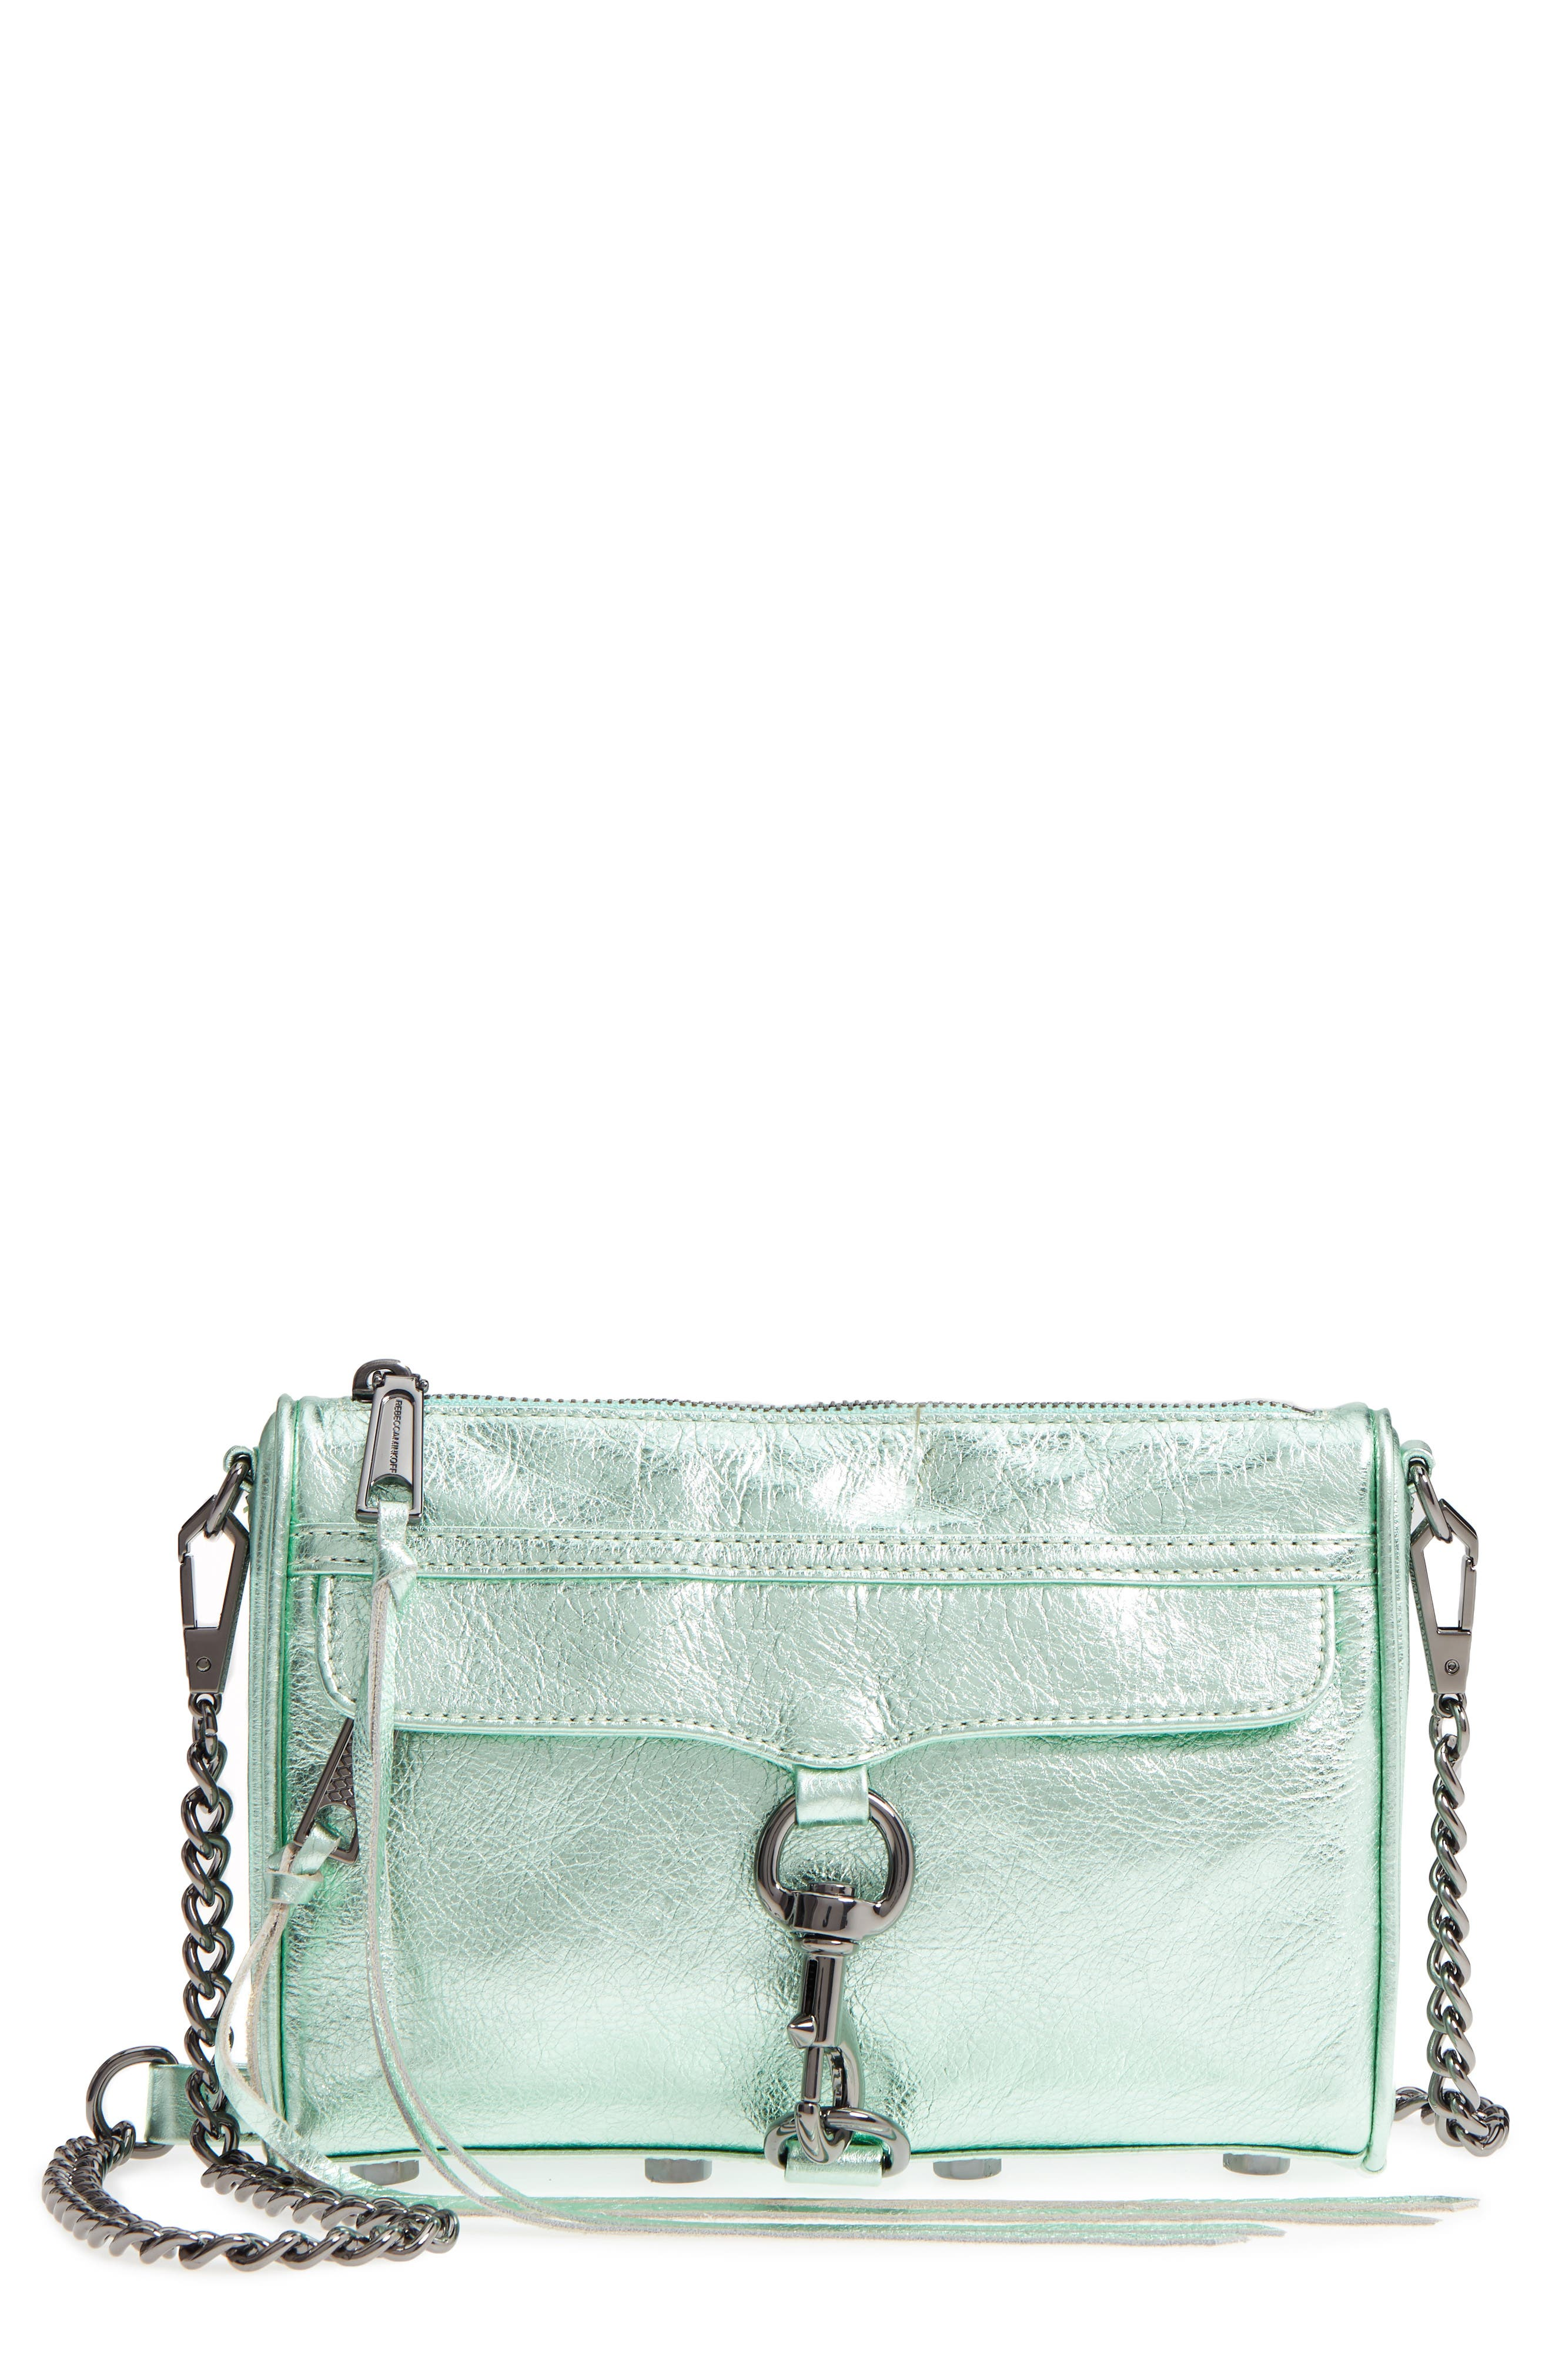 Mini MAC Metallic Leather Convertible Crossbody Bag,                             Main thumbnail 1, color,                             Mint